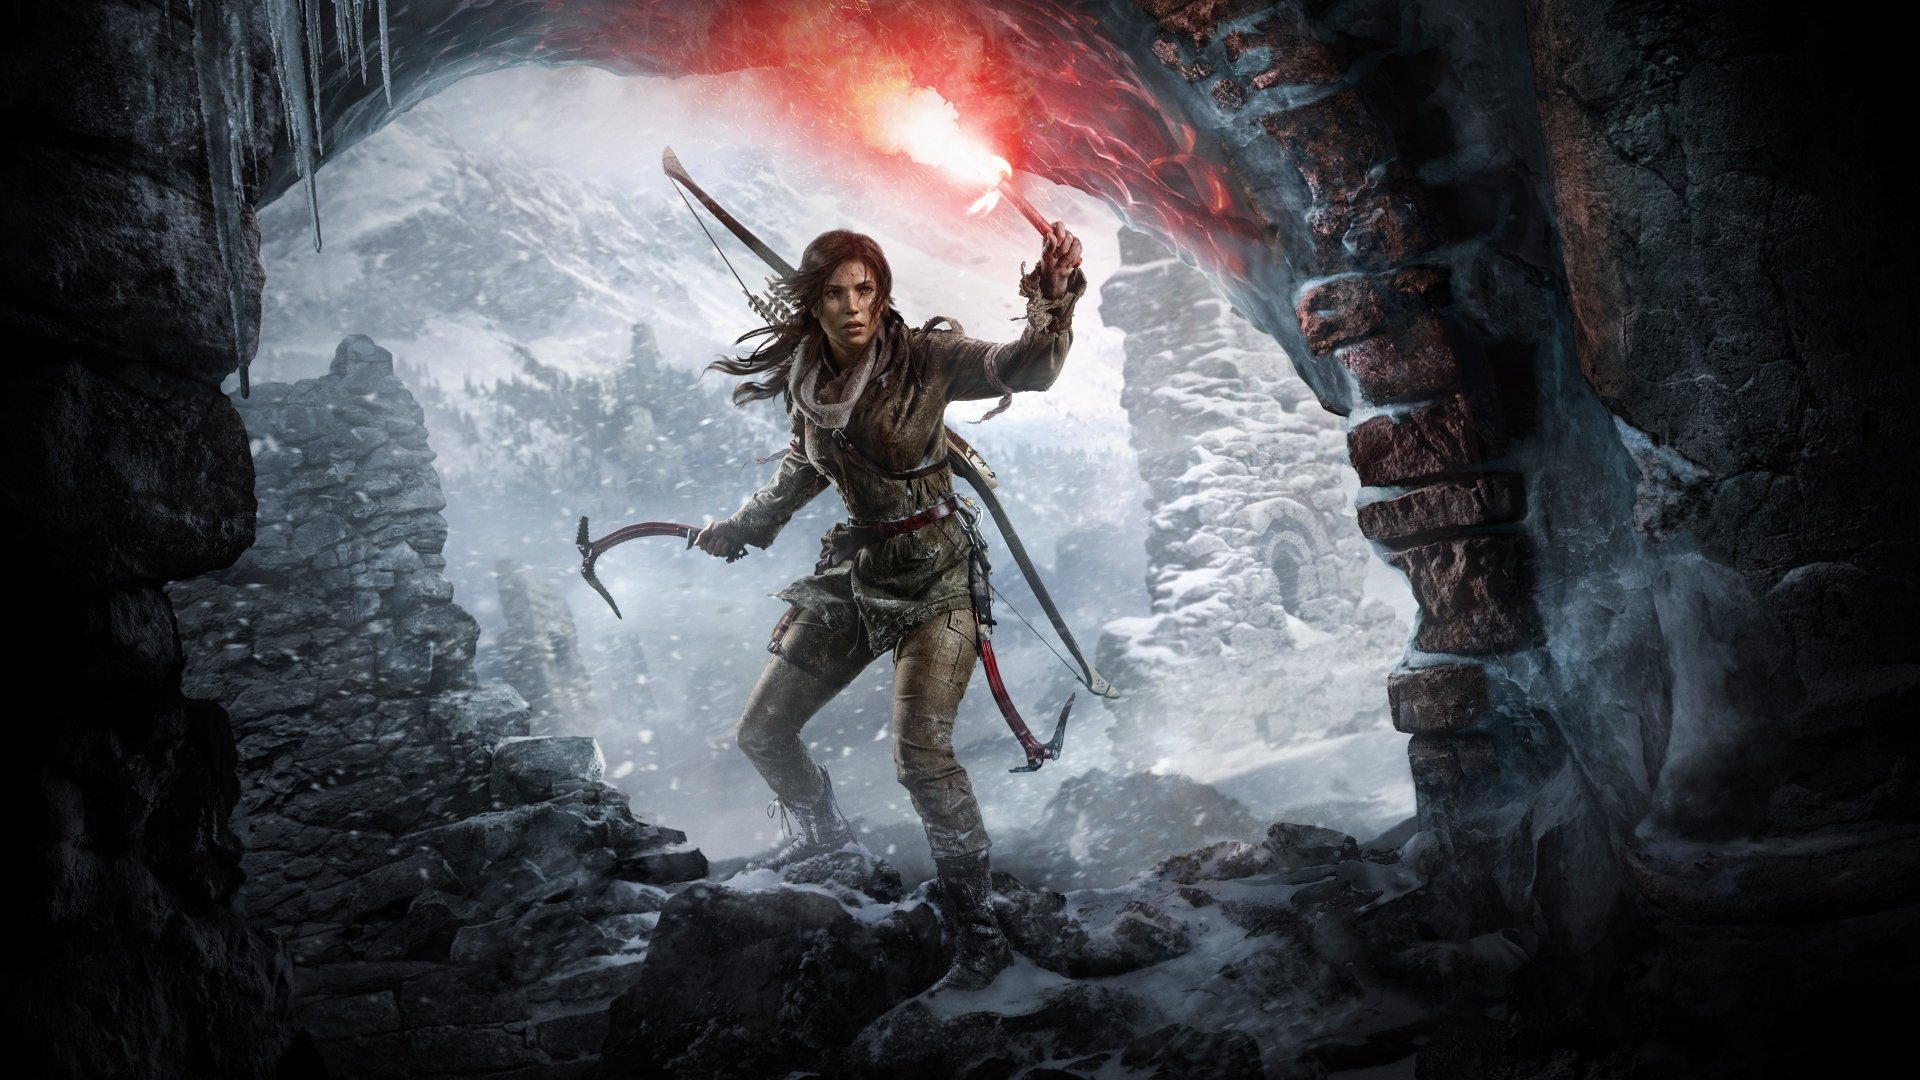 thumb-1920-599037.jpg - Rise of the Tomb Raider